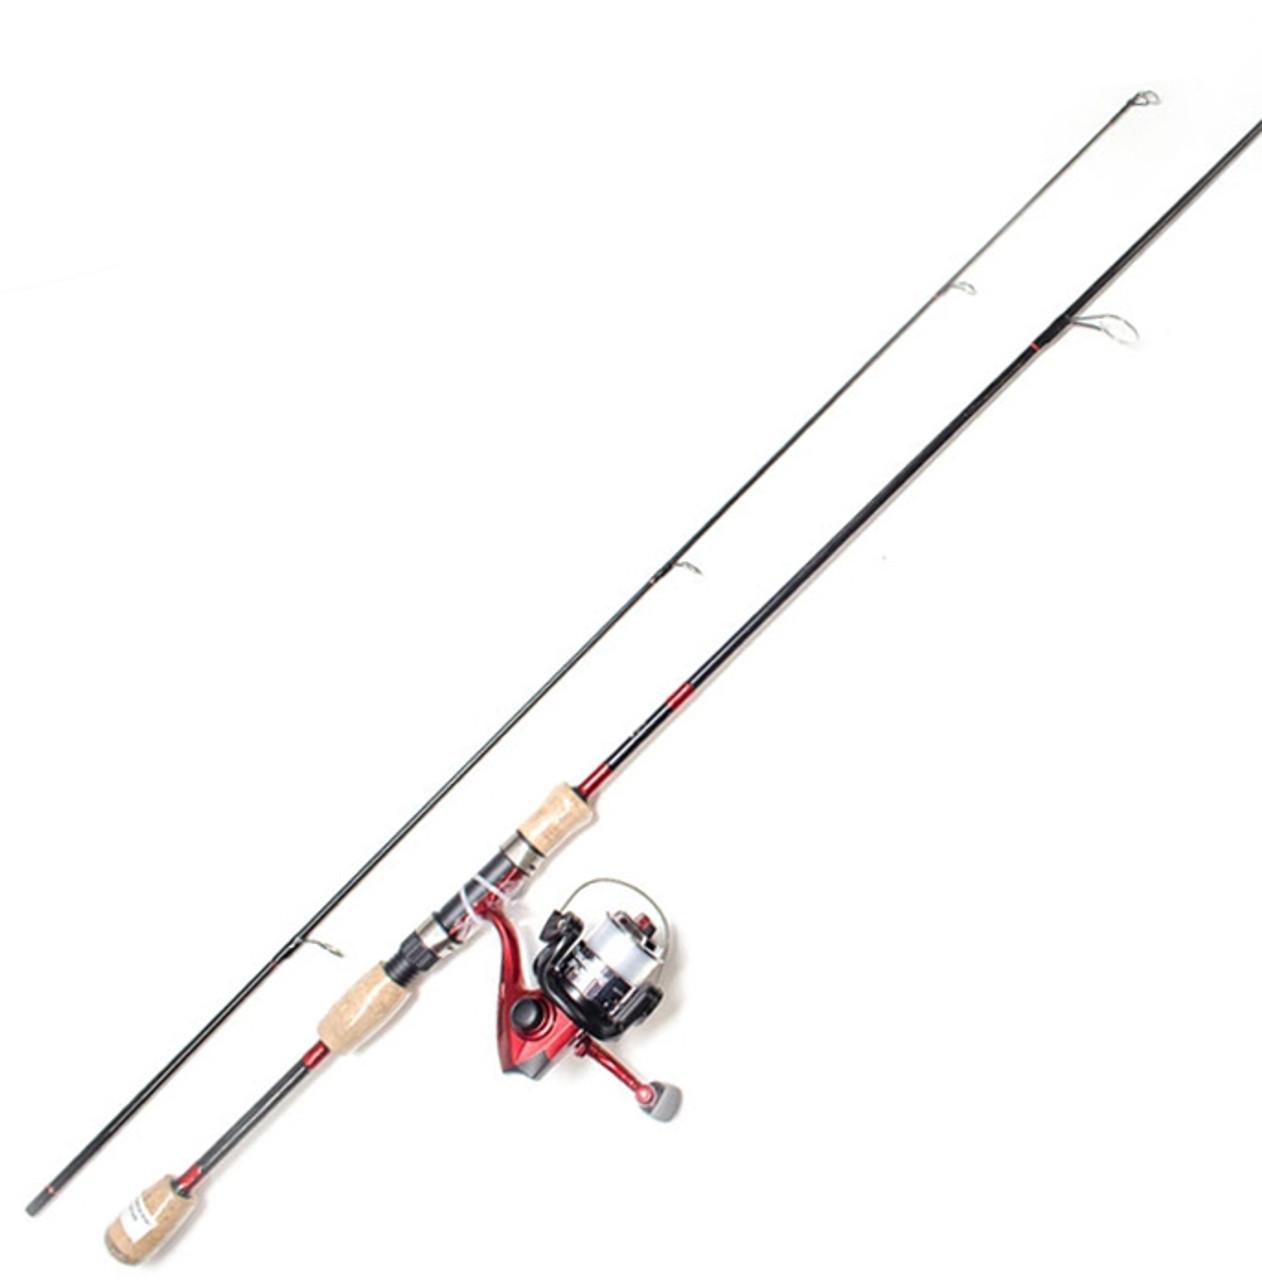 Okuma Fuel Spinning Rod Range All Sizes Available Pike Predator Fishing Rod NEW